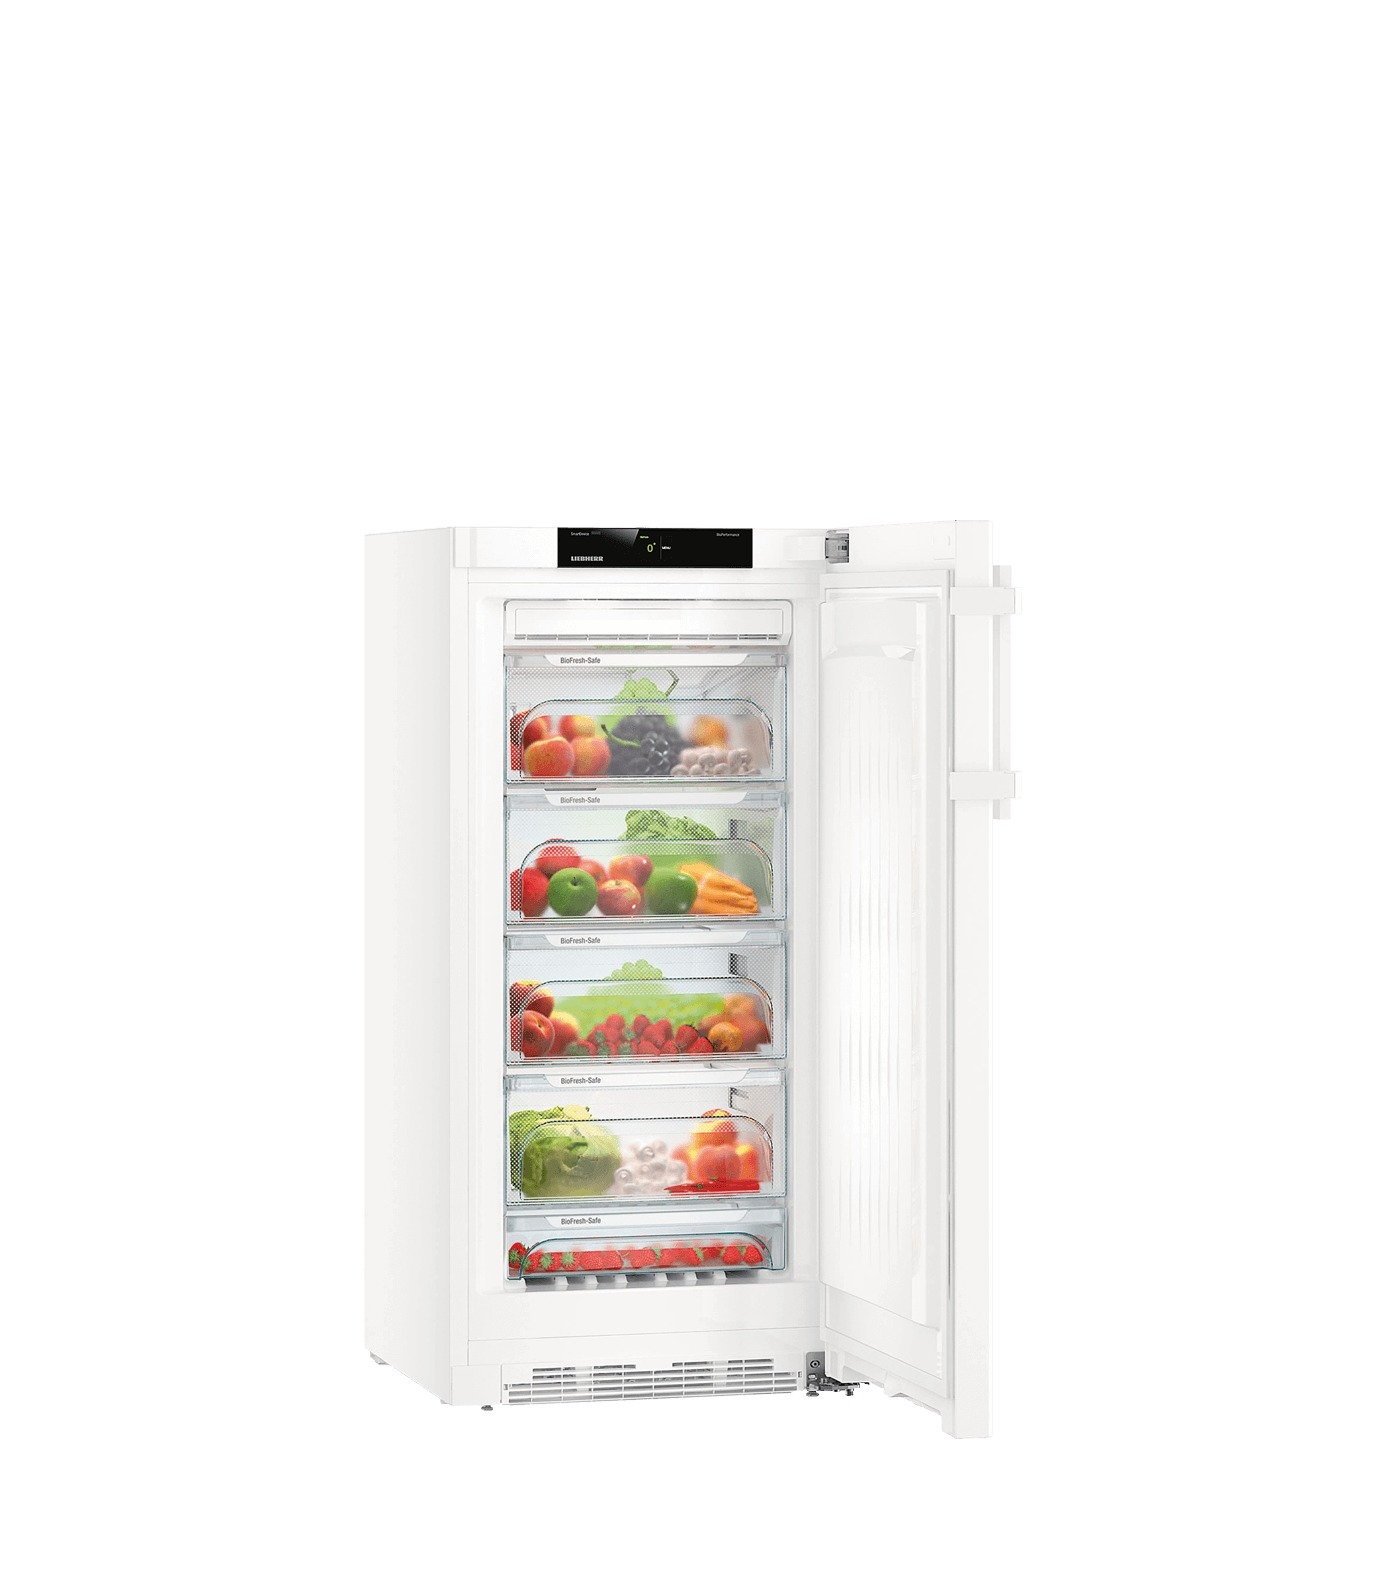 Liebherr B 2830-20 koelkast zonder vriesvak - Prijsvergelijk